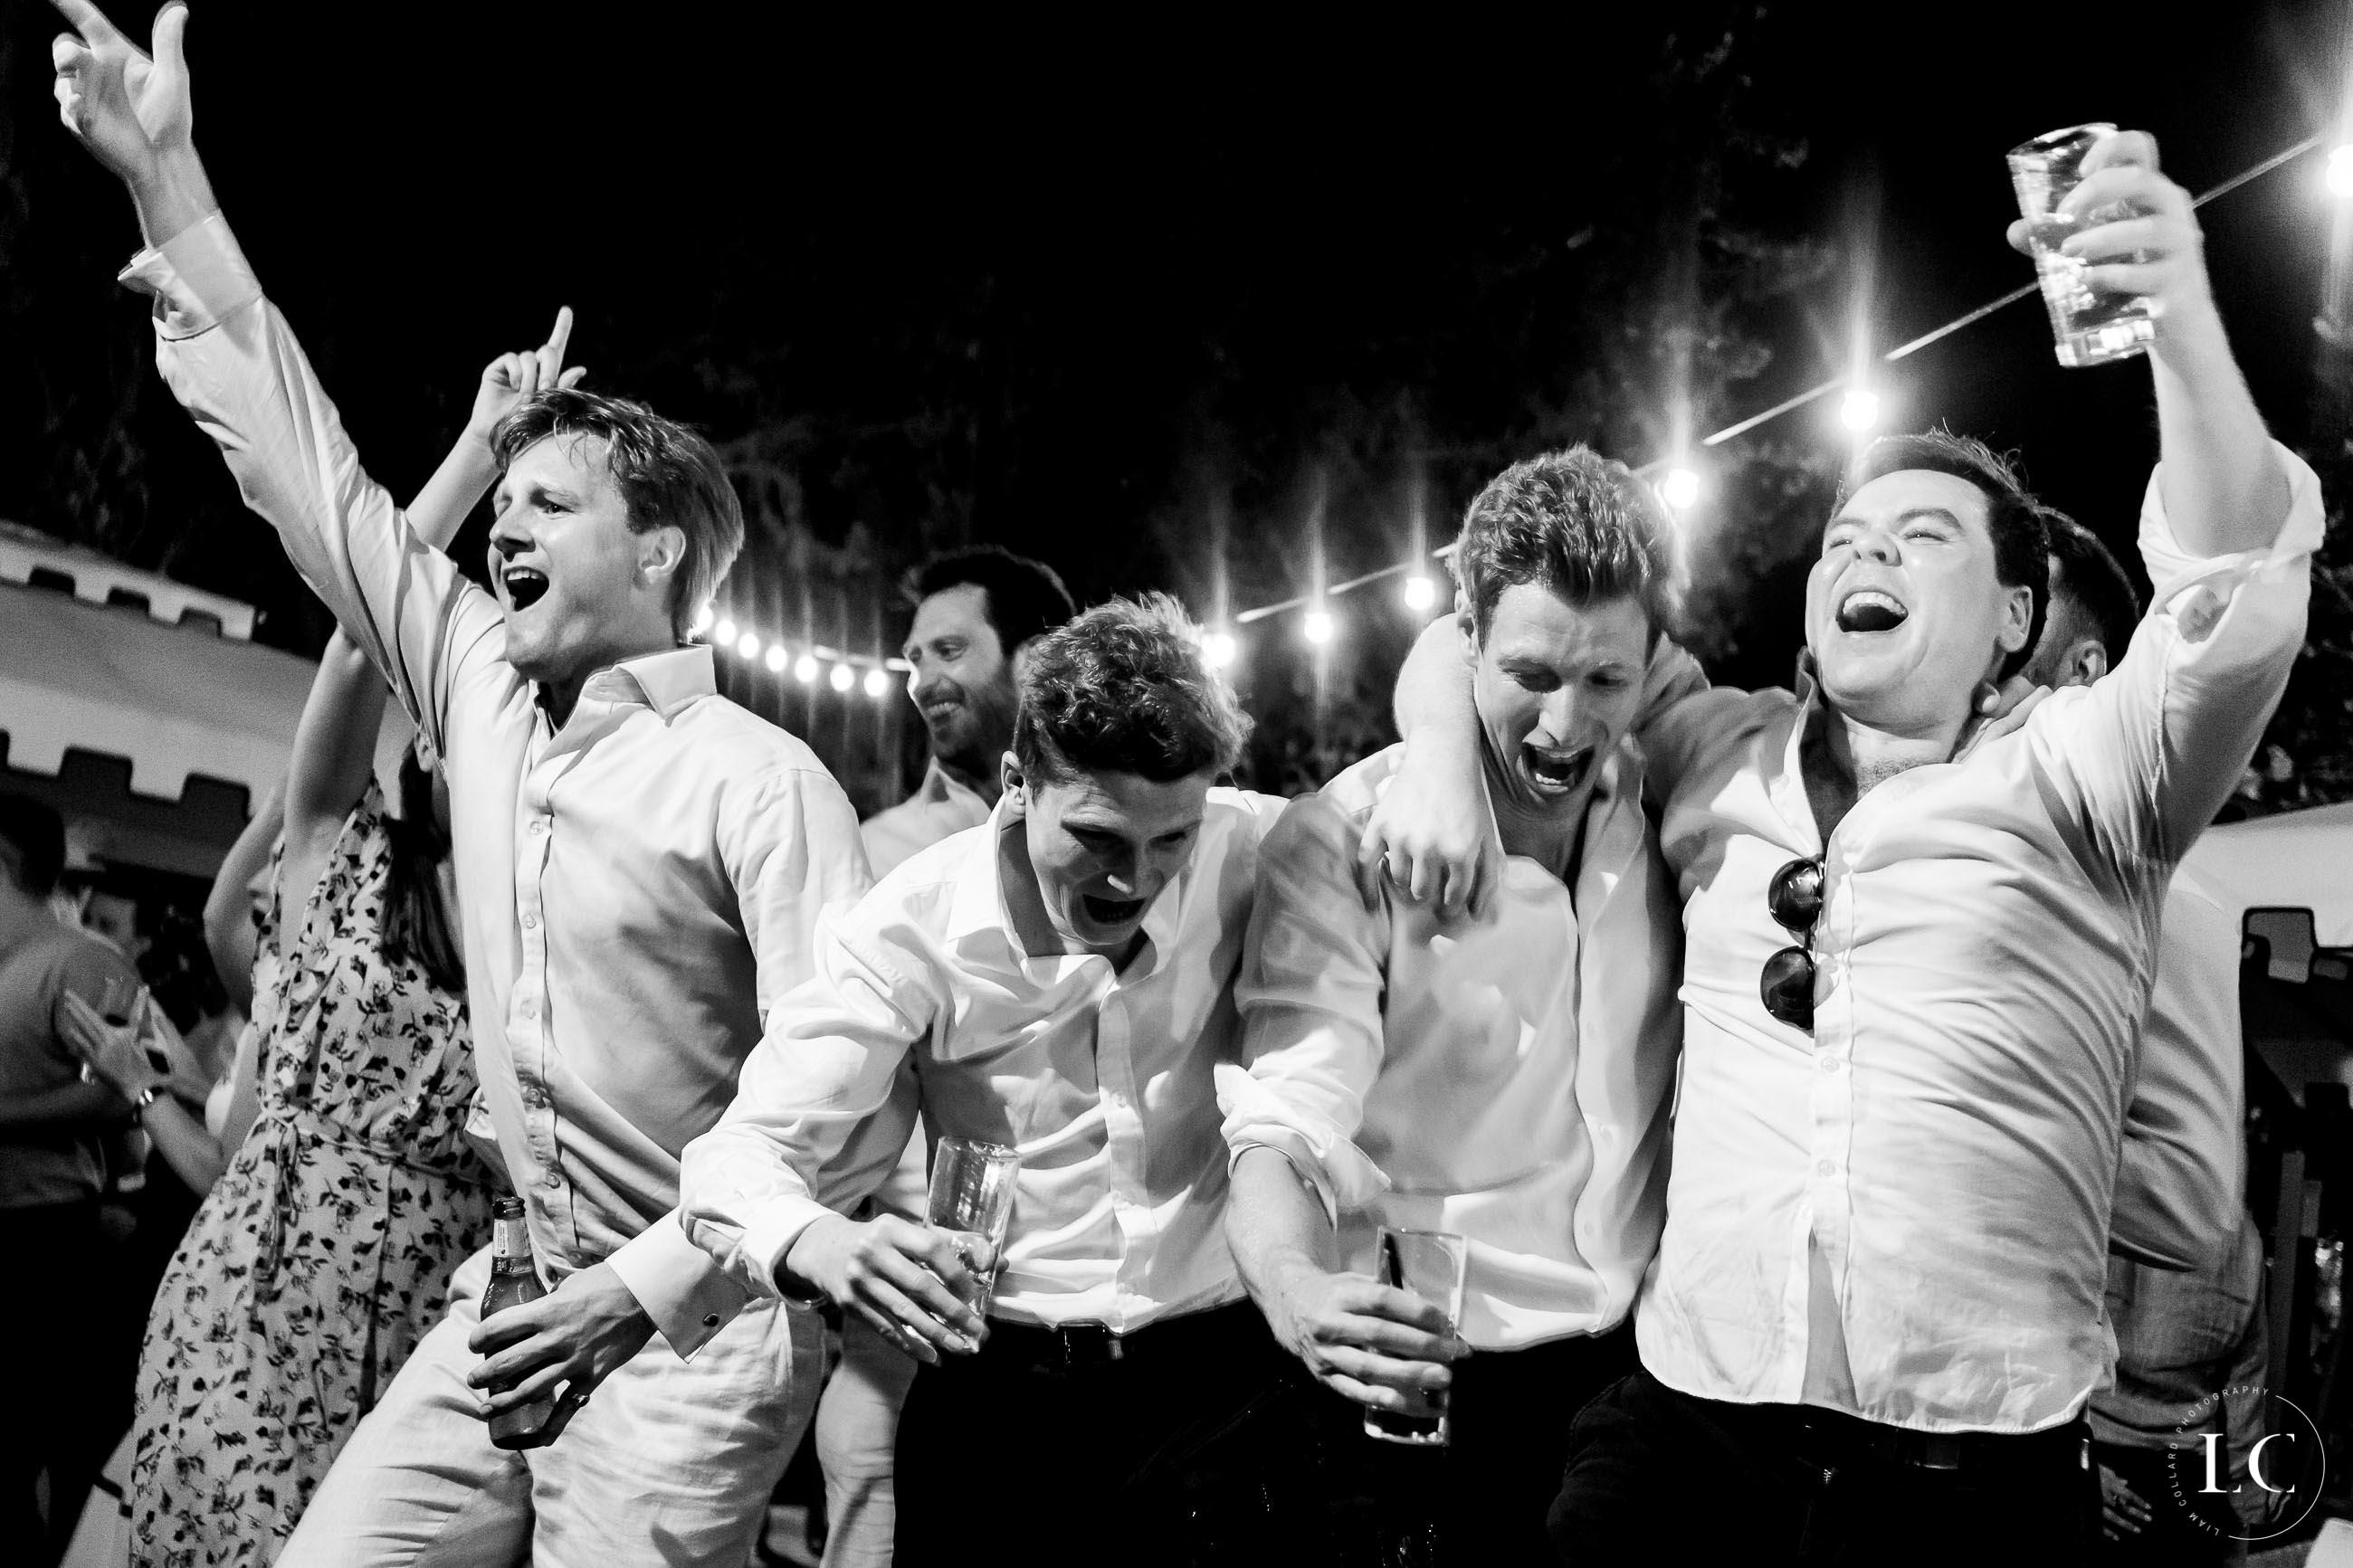 Groomsmen dancing and laughing